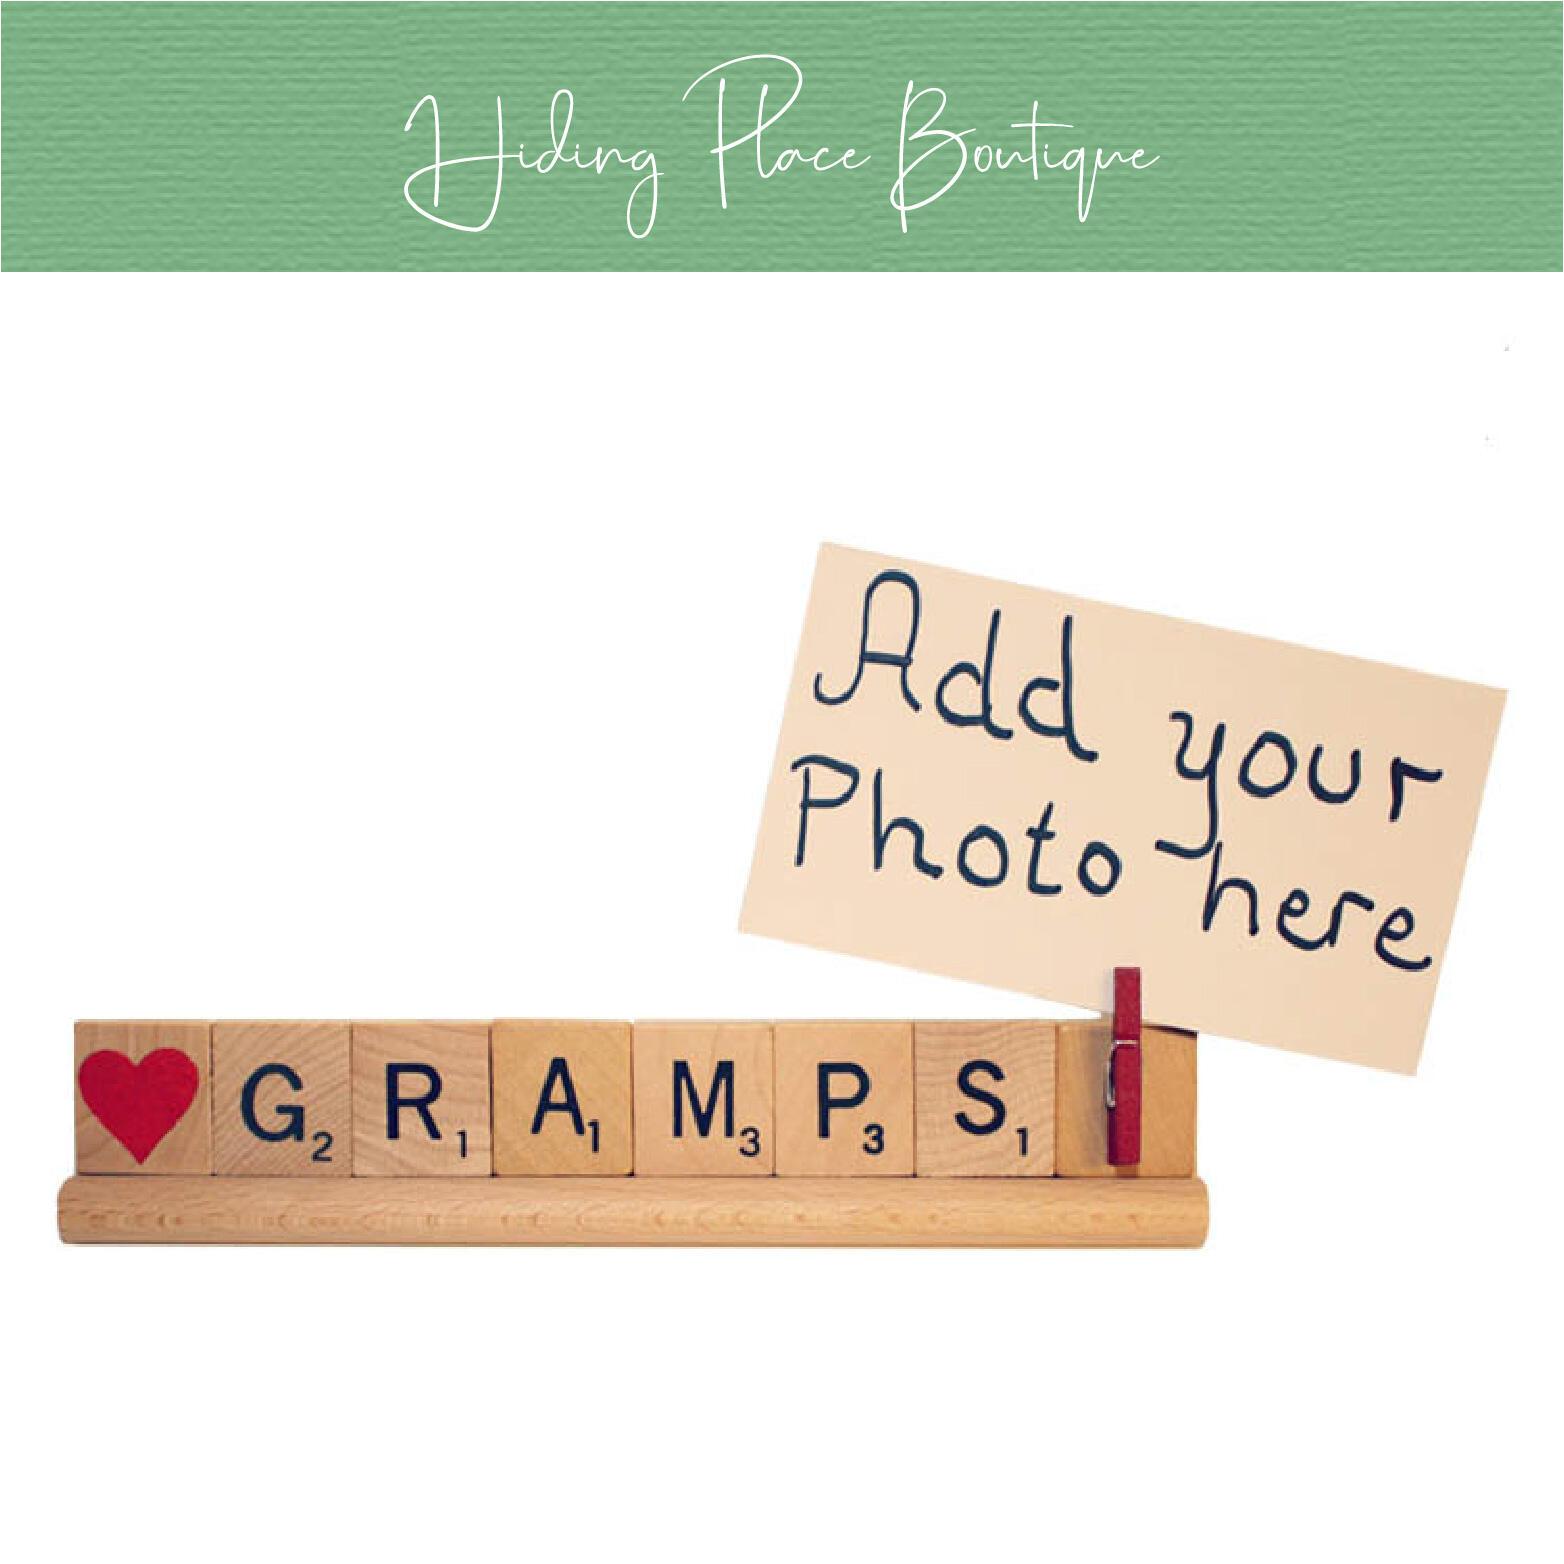 gramps photo frame